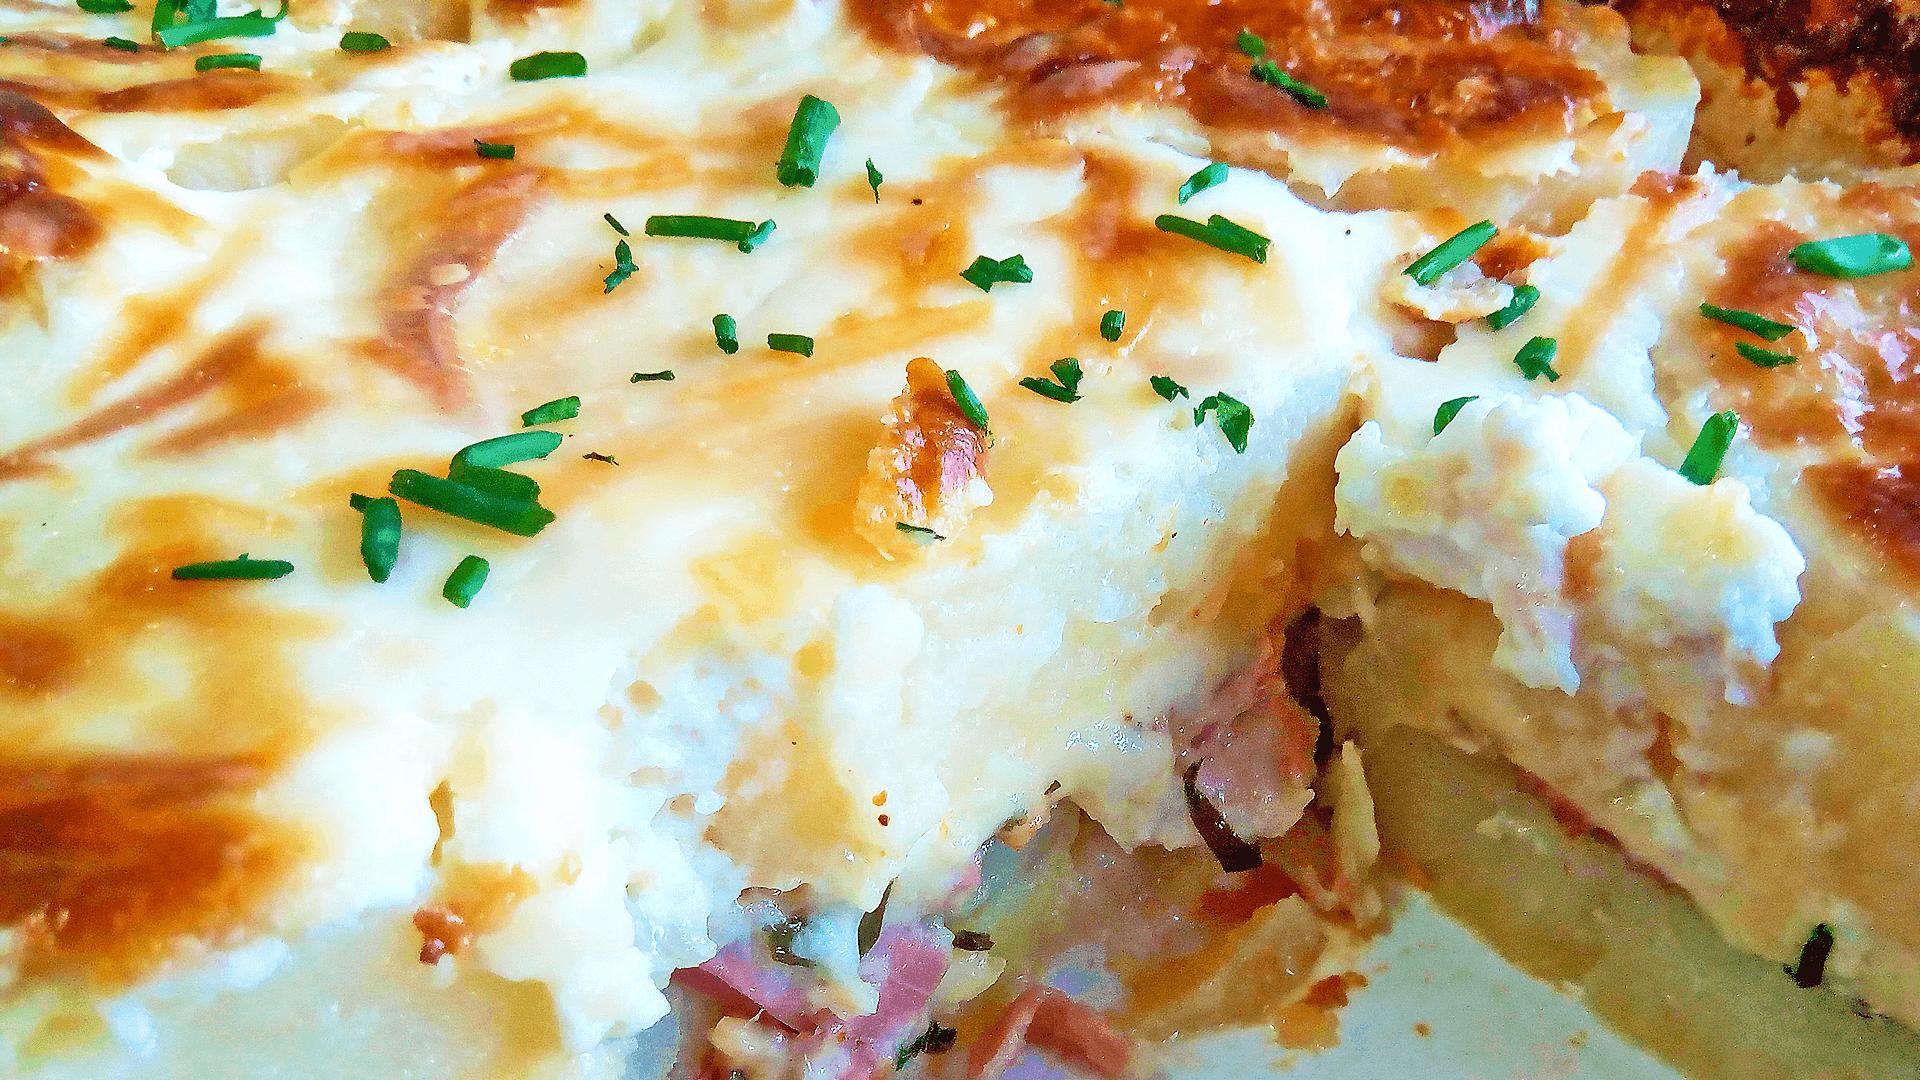 Easy Potato Gratin Savoyard (Potato Bake Recipe with Bacon)